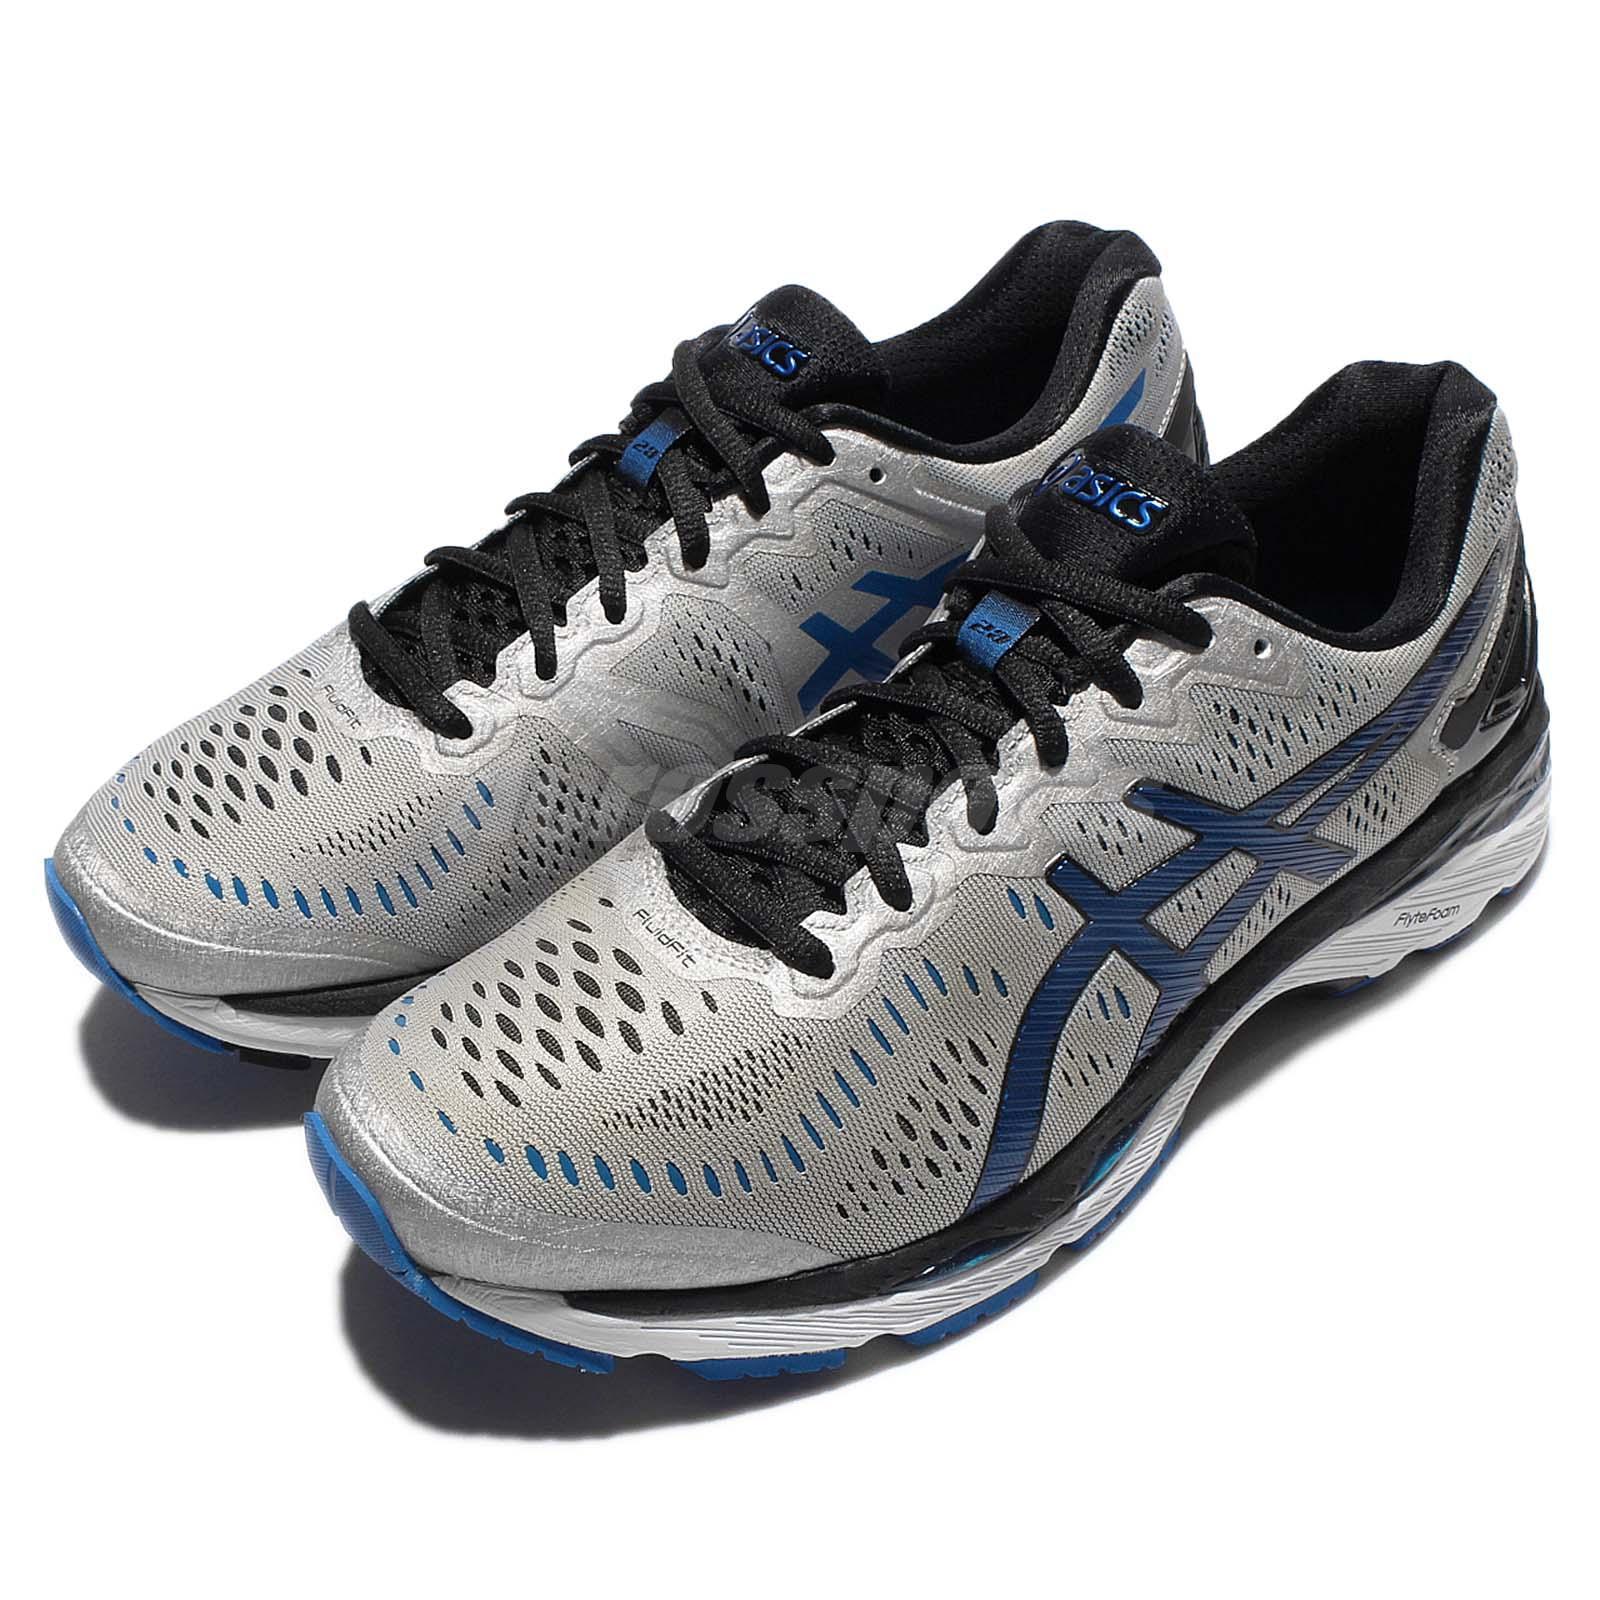 asics gel kayano 23 2e wide grey navy silver mens running shoes t647n 9345 ebay. Black Bedroom Furniture Sets. Home Design Ideas